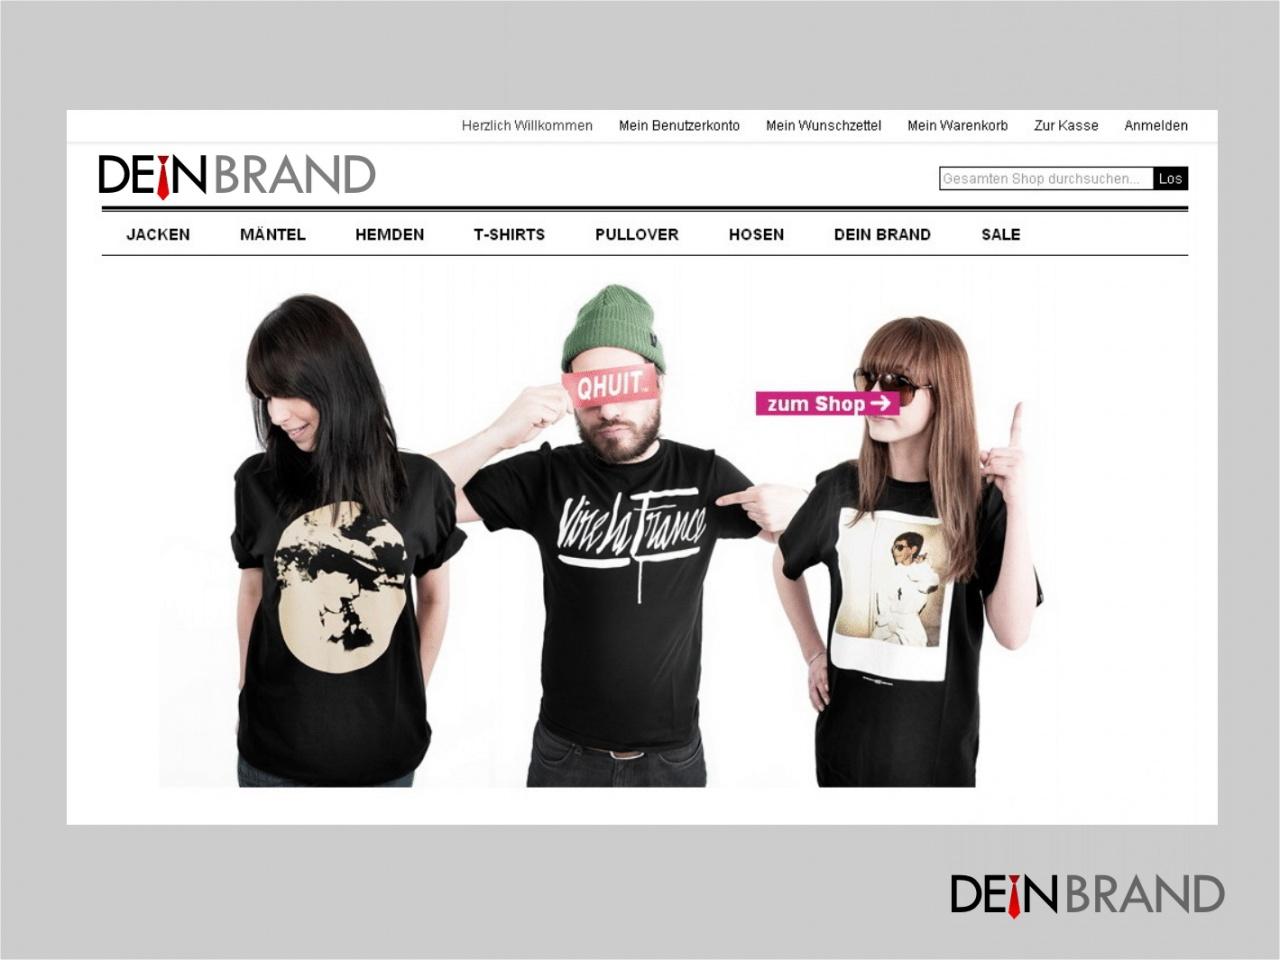 design #56 of mldesign